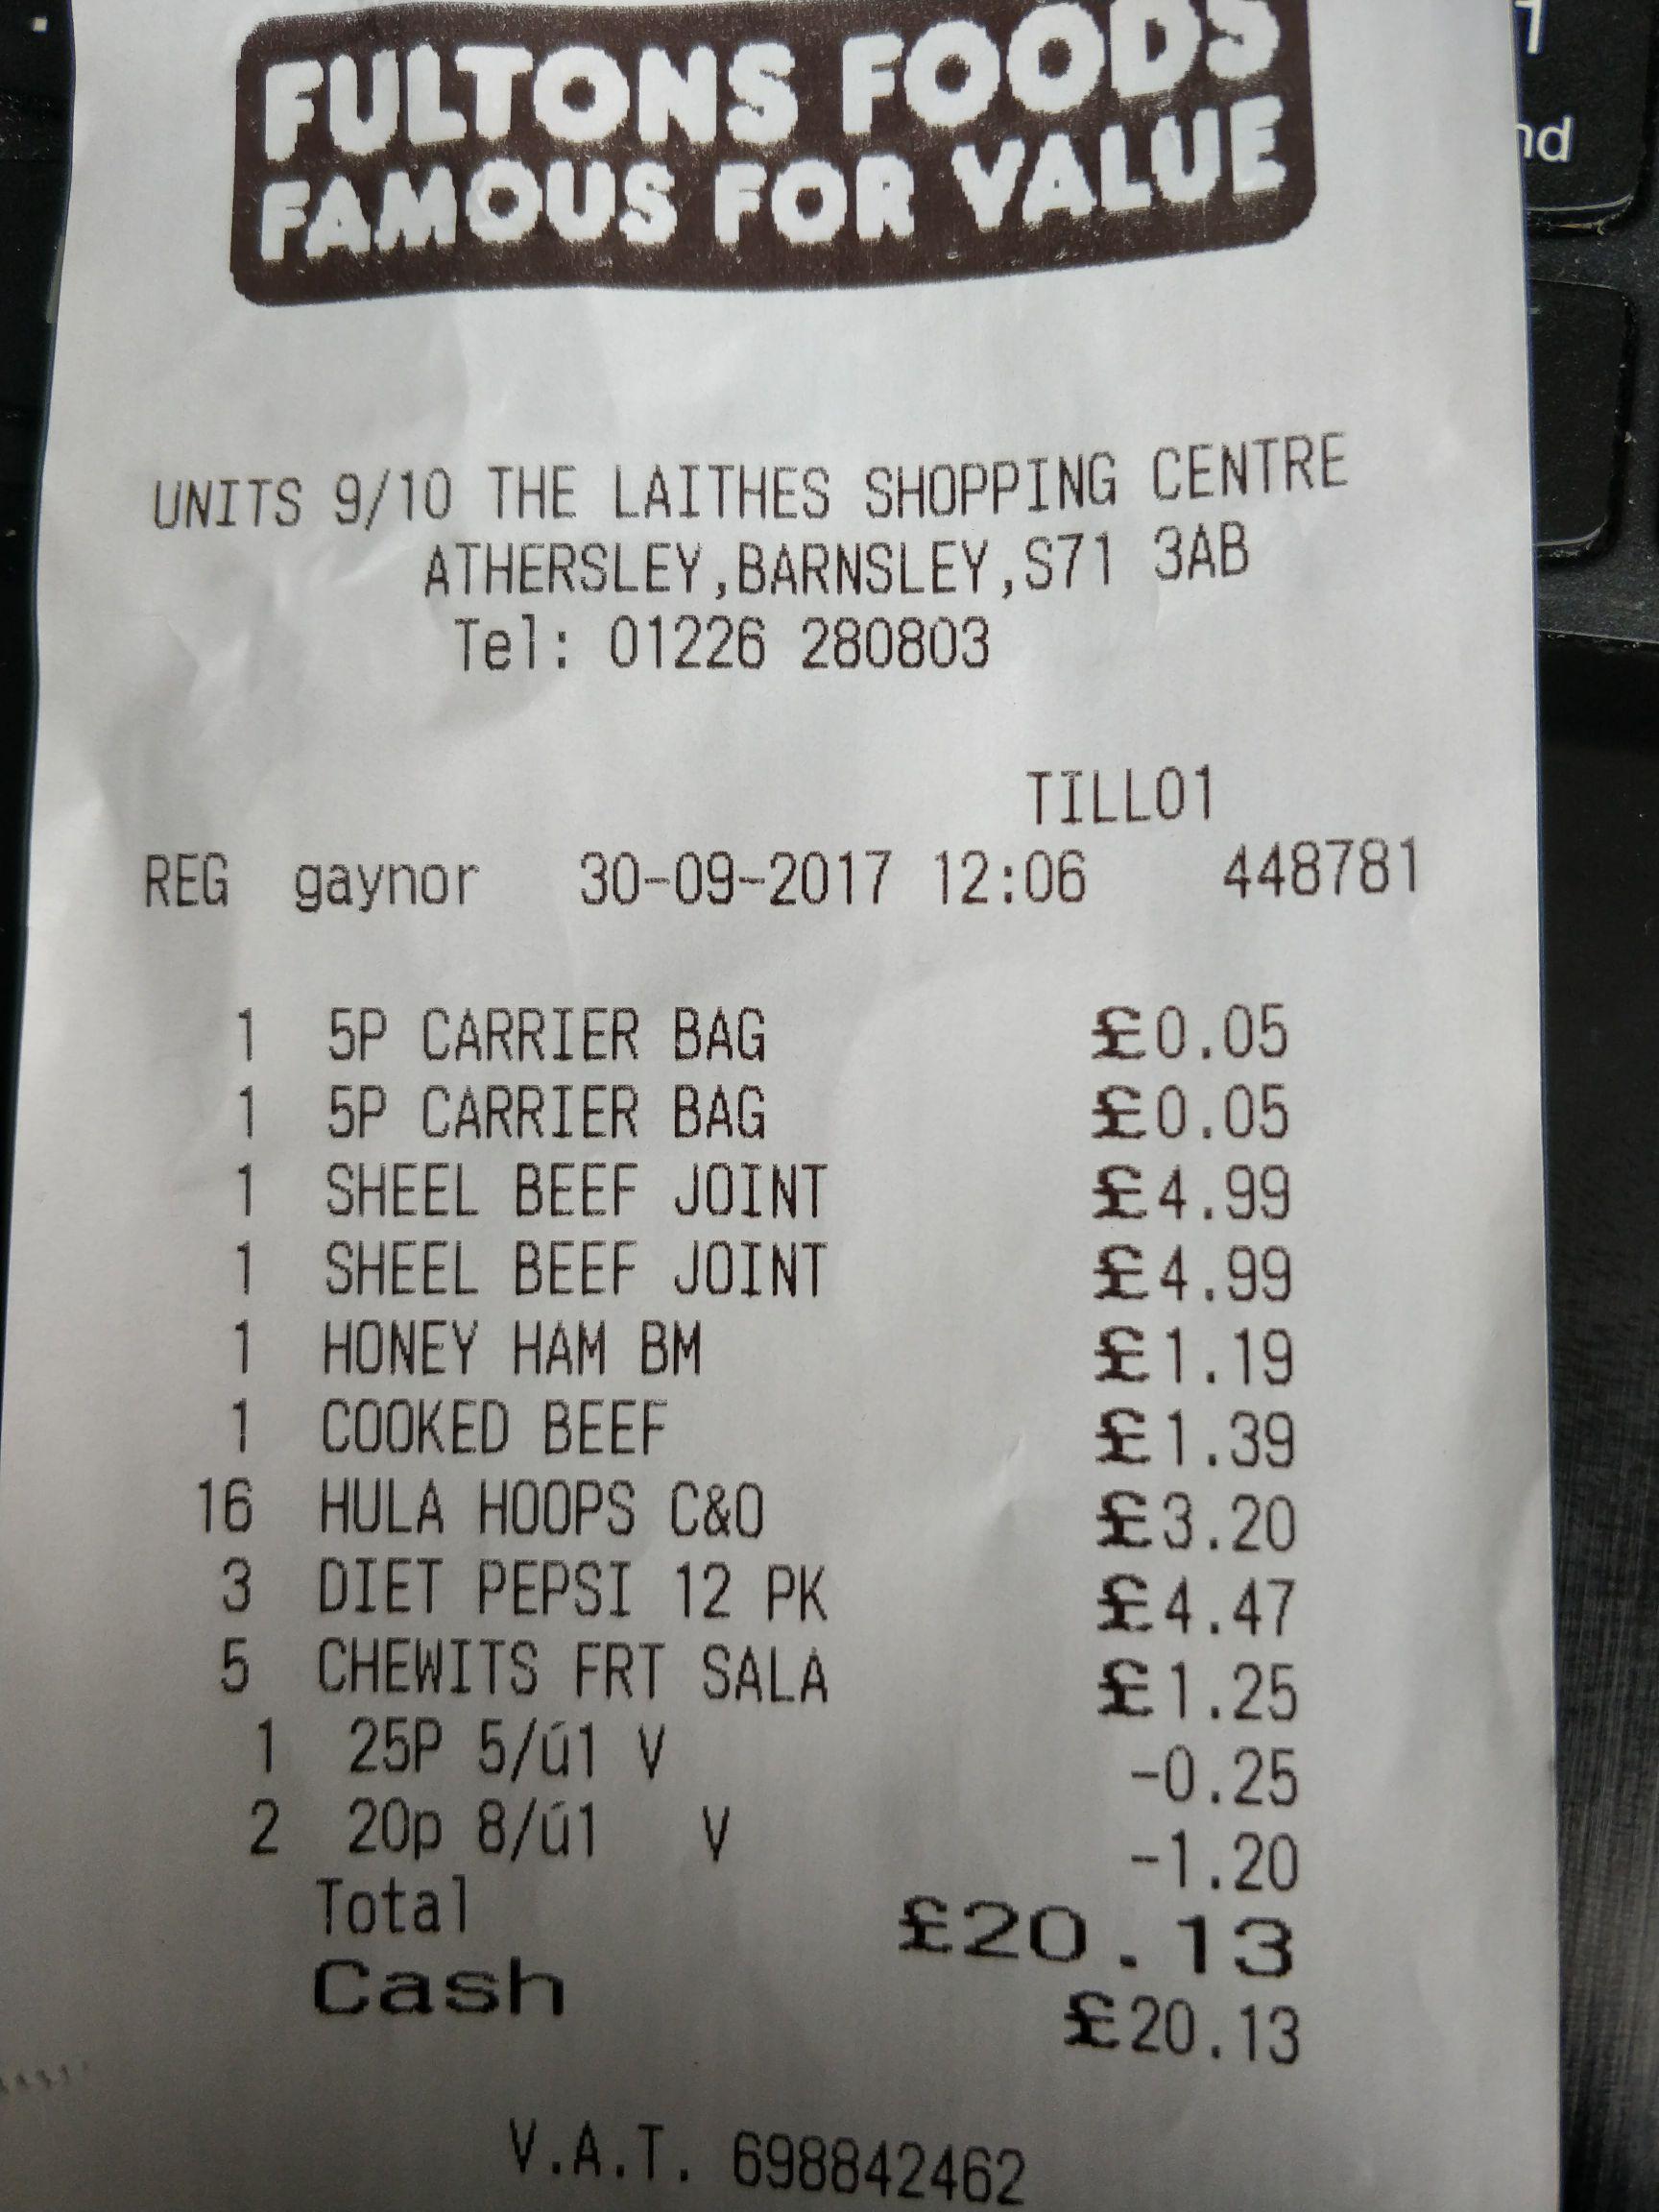 12 pack diet pepsi @ Fulton's foods (Barnsley) - £1.49